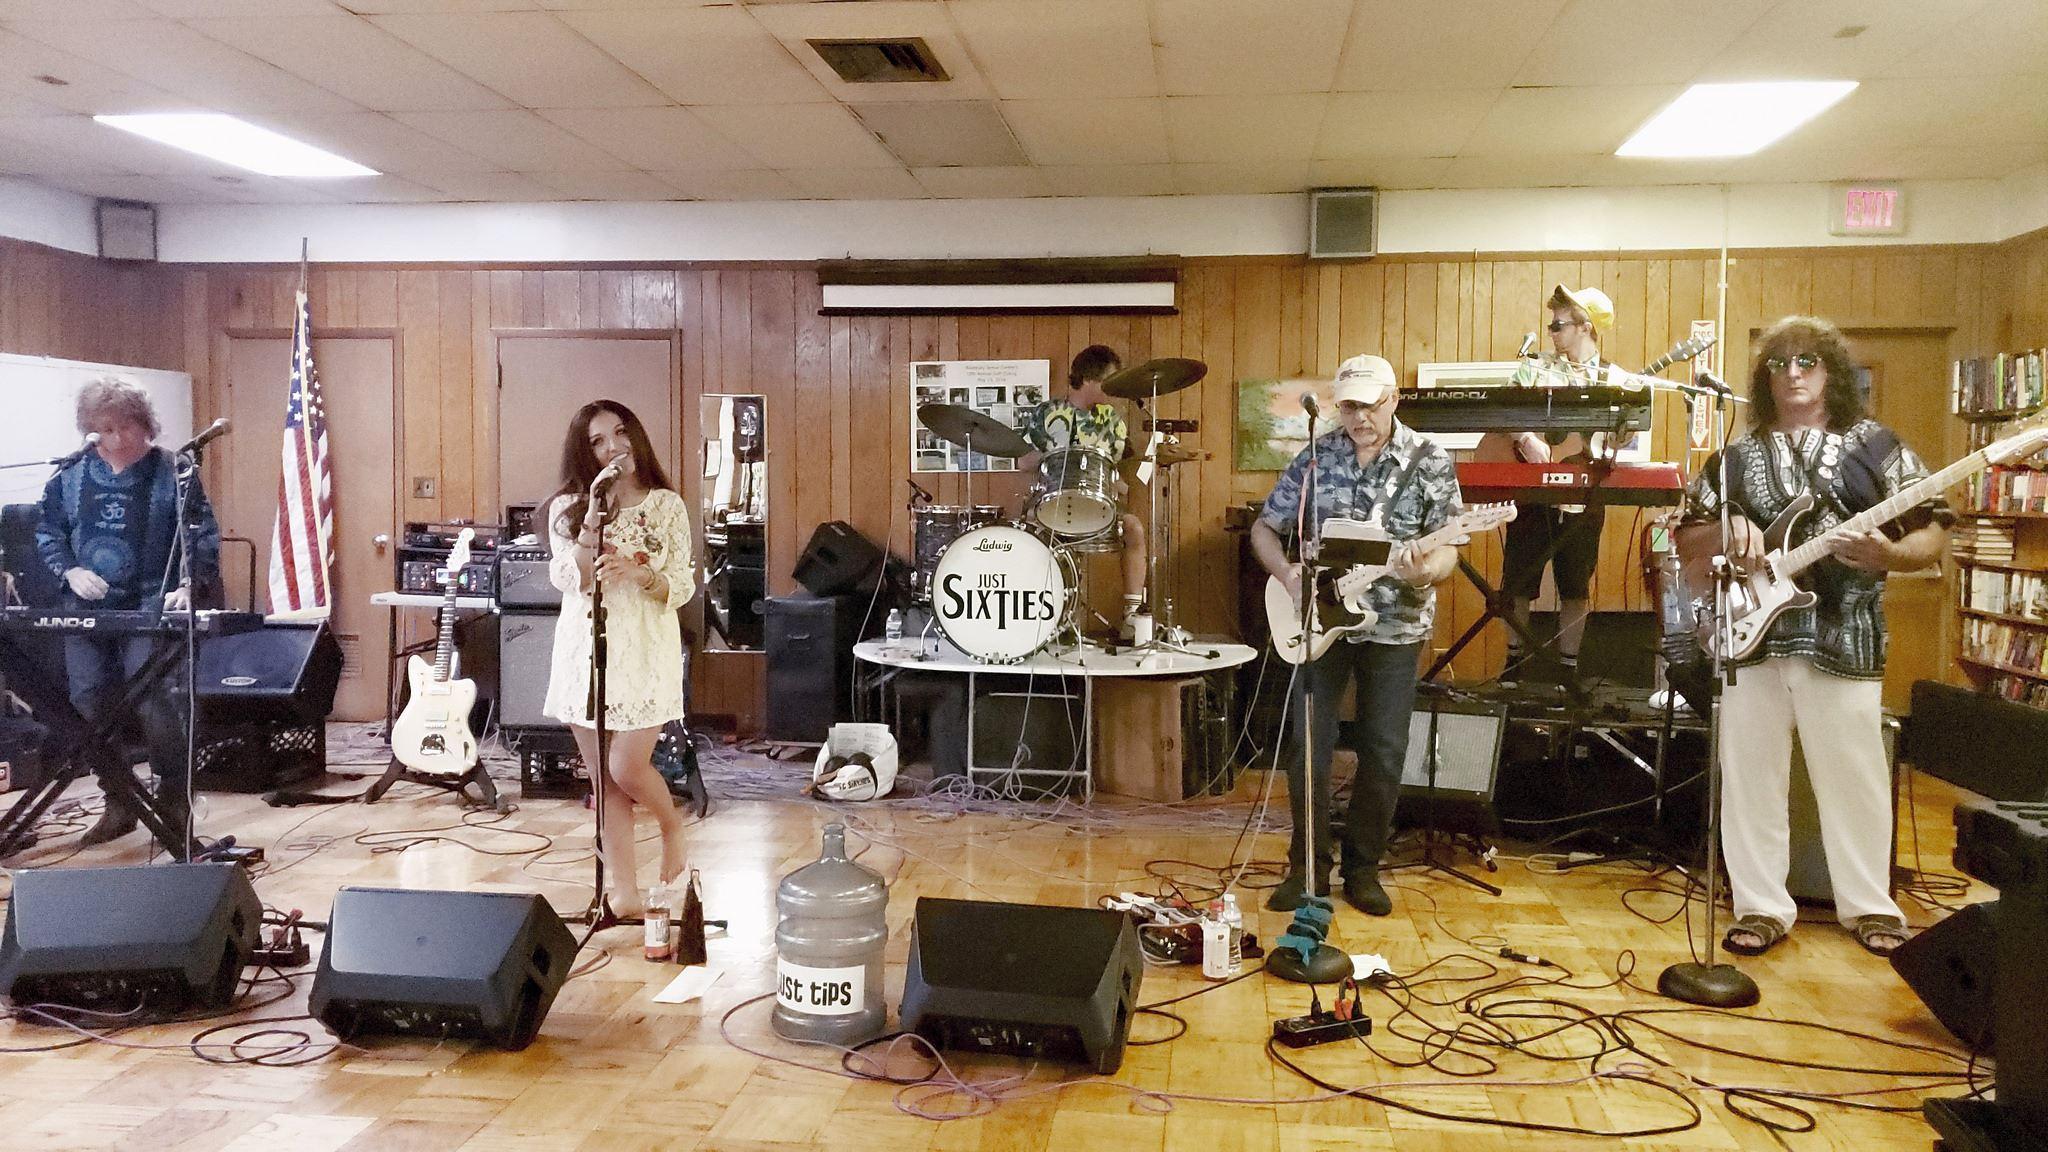 2018 Westbury Arts - Concert - Just Sixties